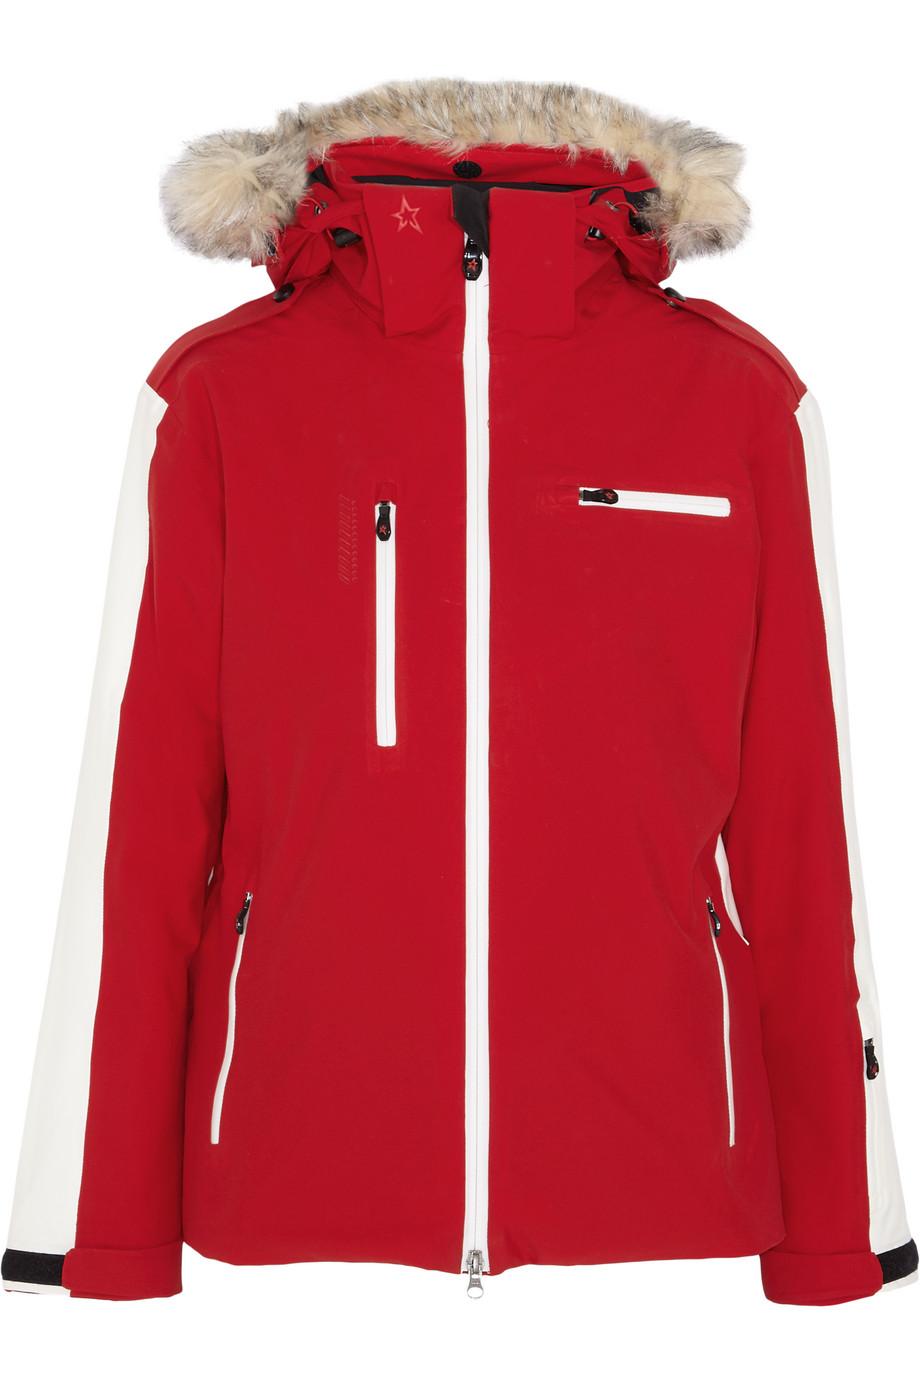 Perfect Moment Qanuk Pro Faux Fur-Trimmed Shell Ski Jacket, Red, Women's